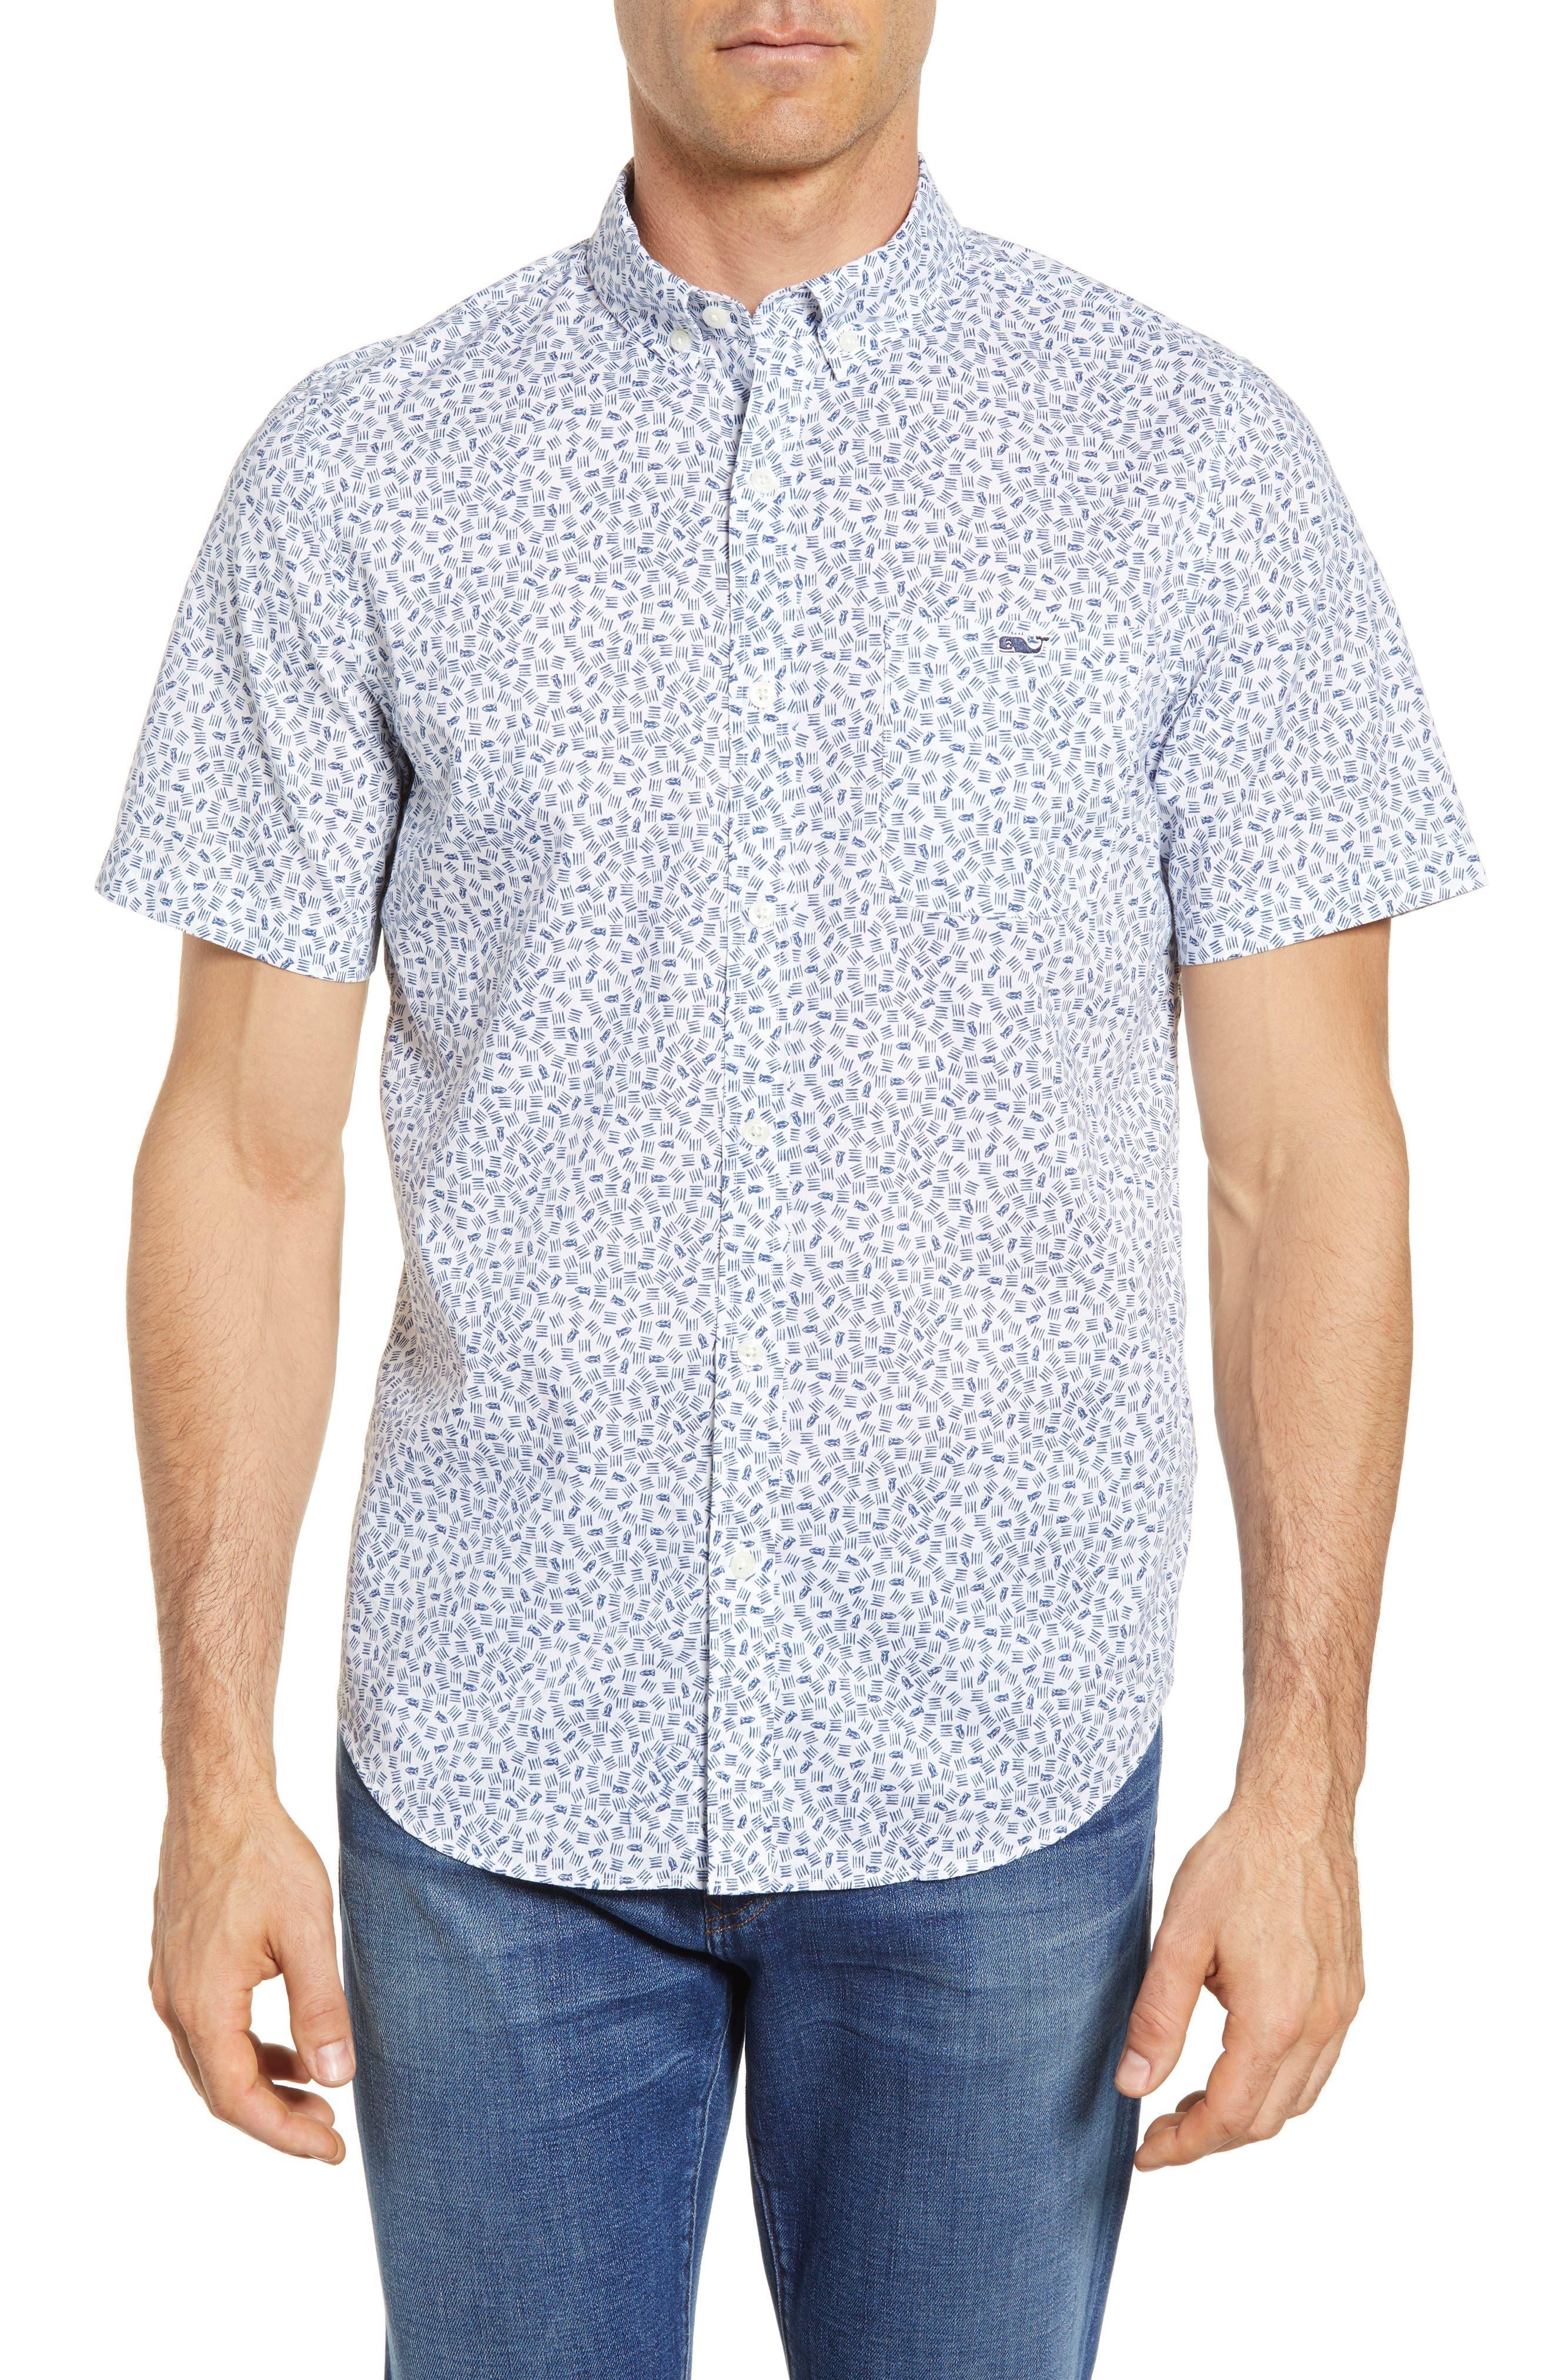 VINEYARD VINES Fish Dash Tucker Slim Fit Sport Shirt, Main, color, 100